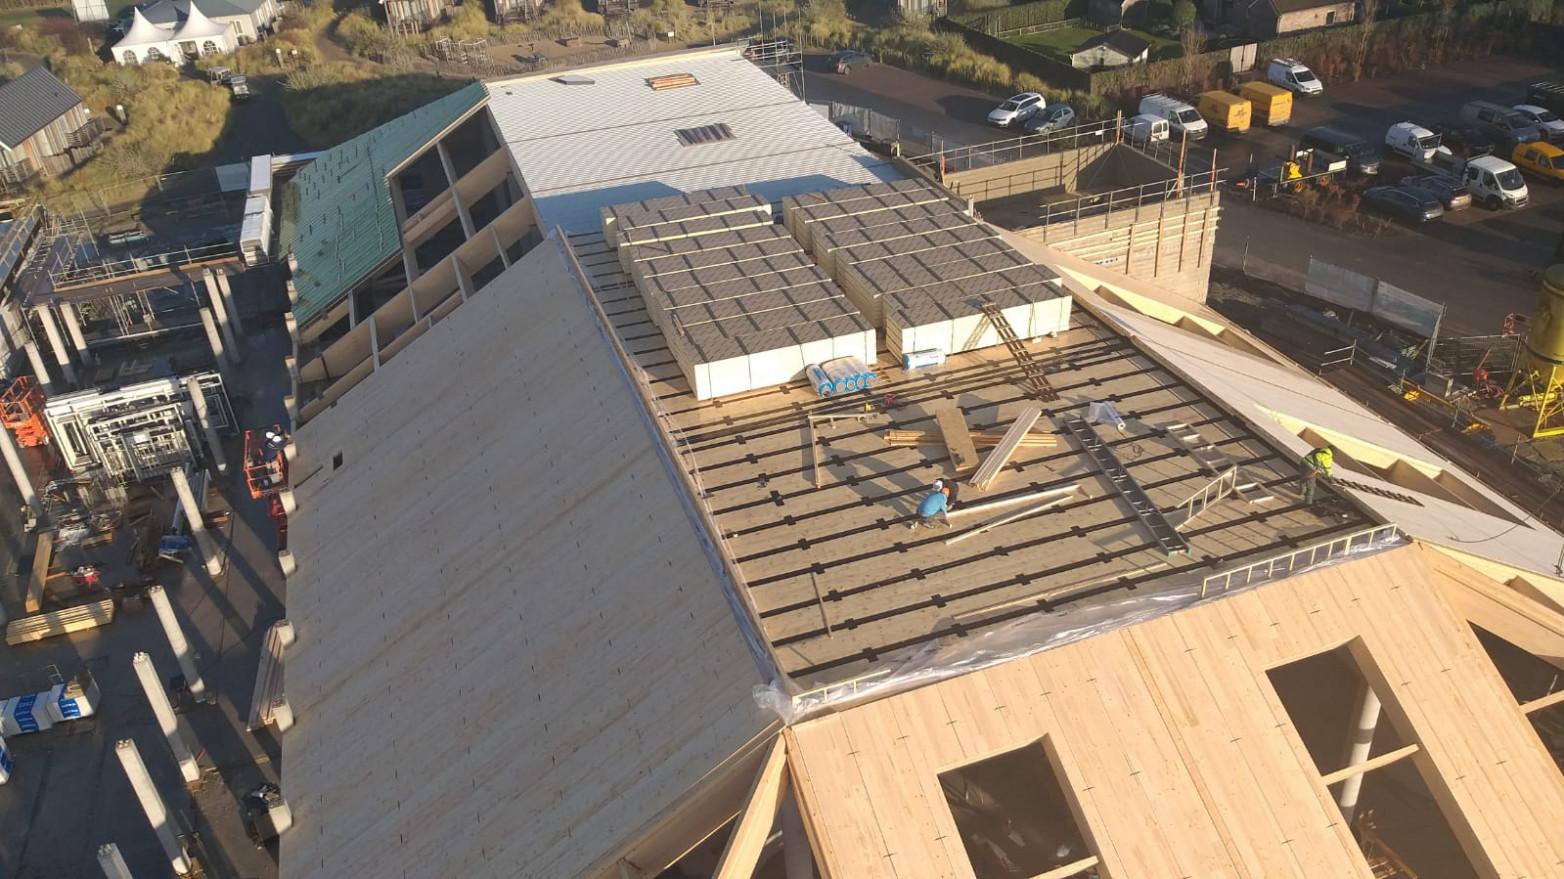 houtbouwer_draagconstructies_vakwerk_hoofdgebouw_e20c2d917b717f53fa22bd9f509fb25f (2).jpg